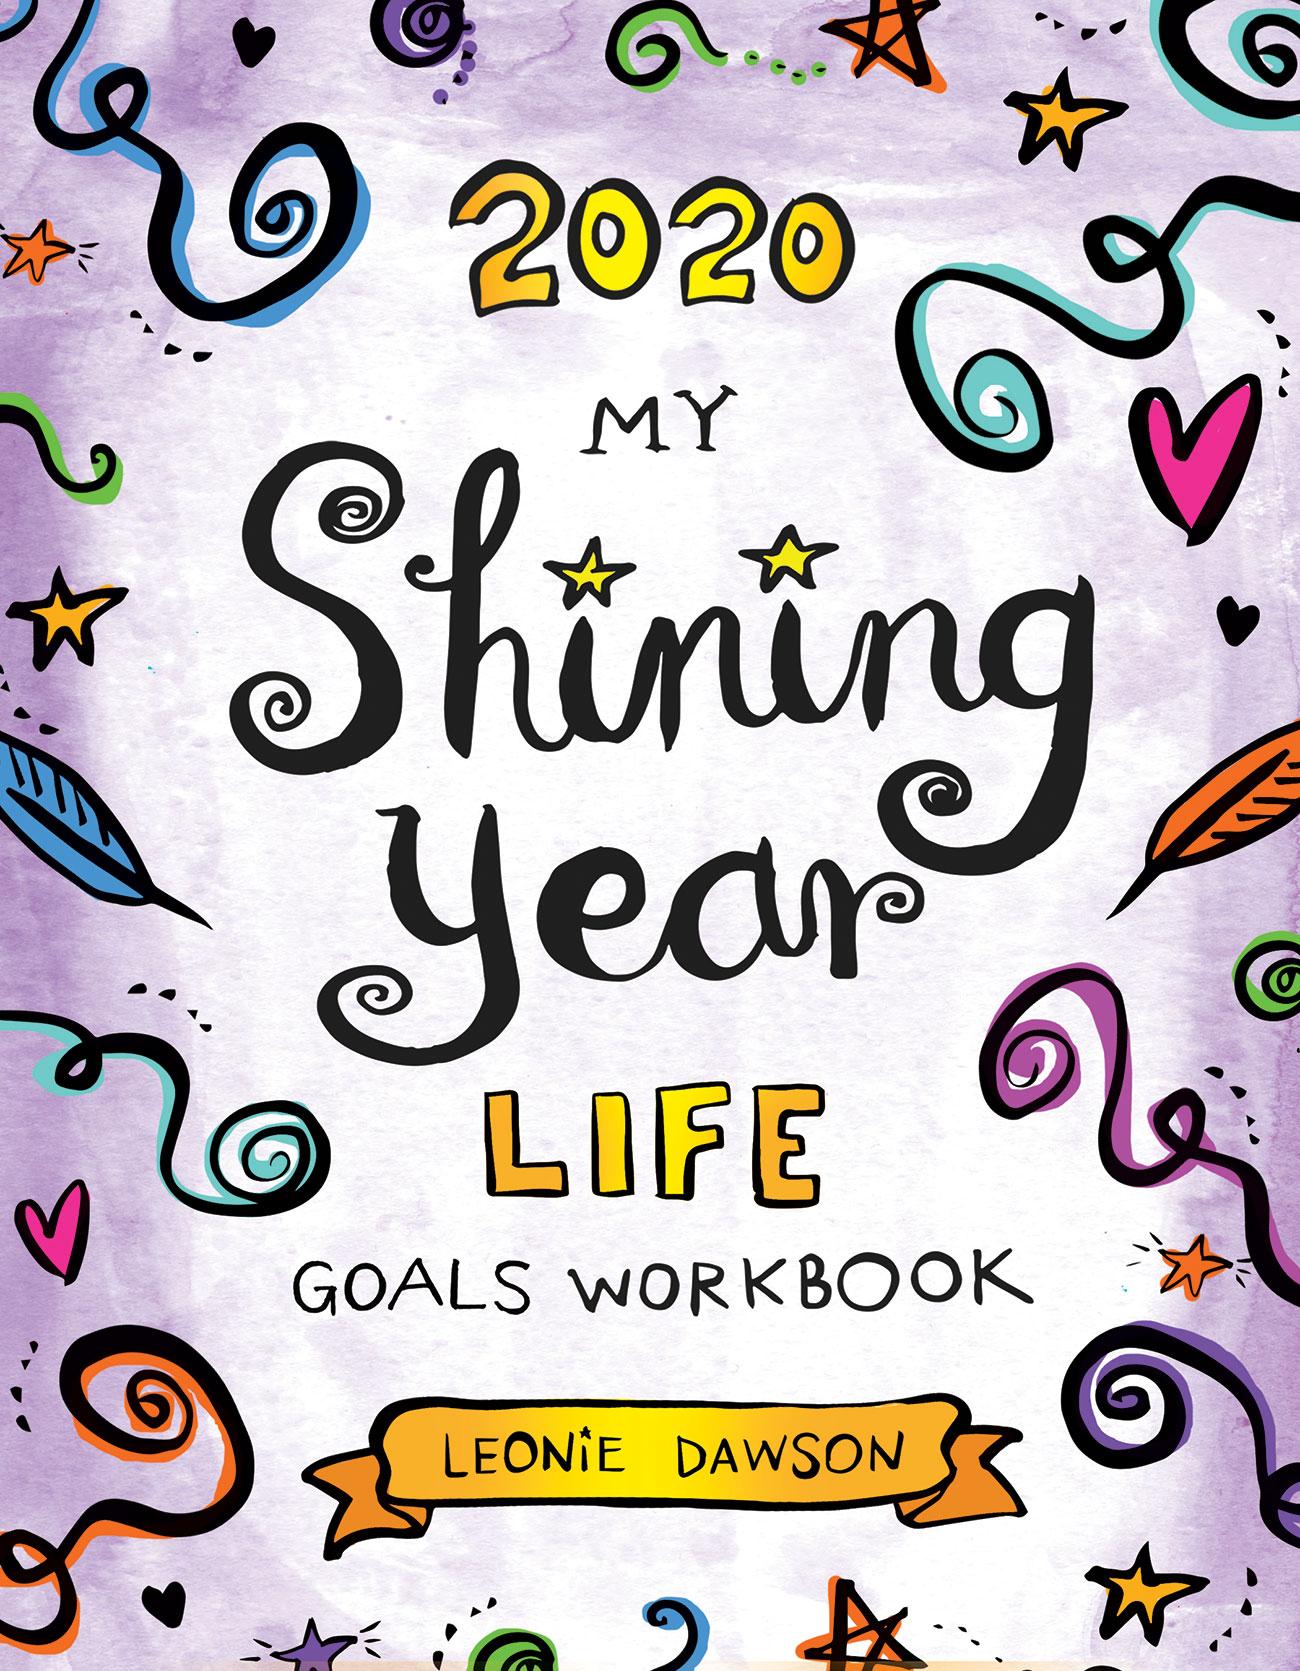 Do It Best Fall Market 2020 2020 My Shining Year Life Goals Workbook   BenBella Books